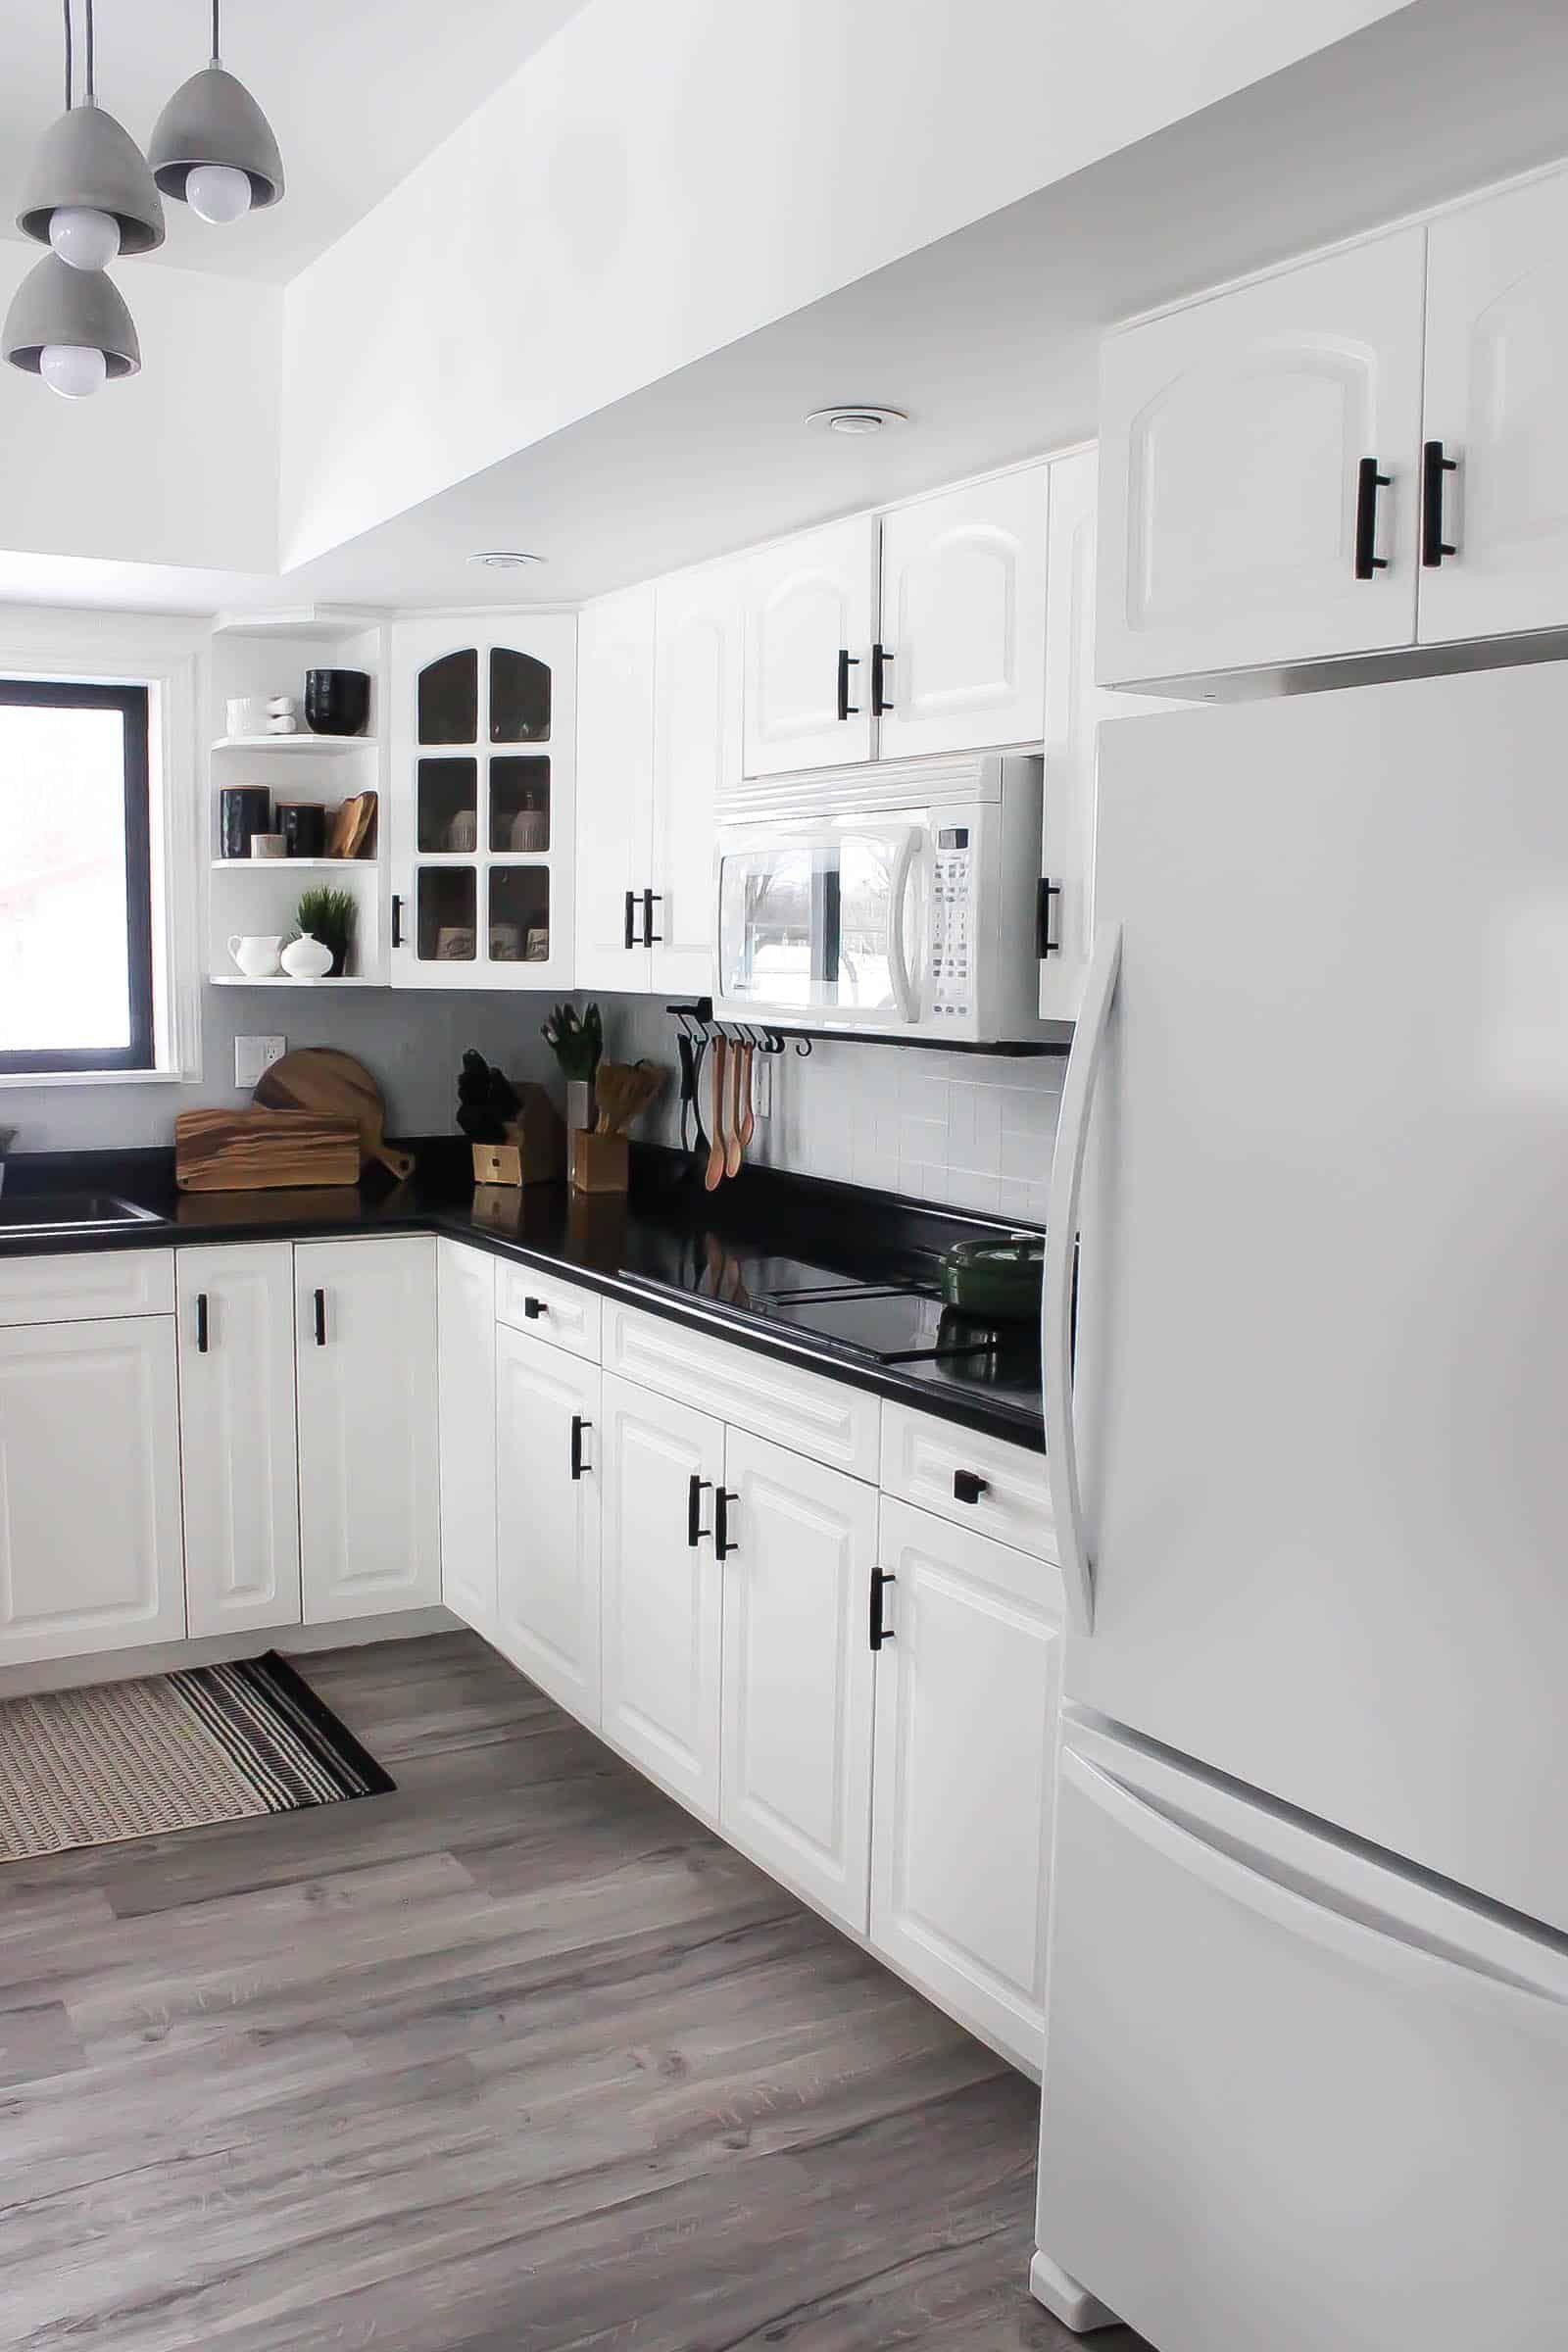 White Kitchen Cabinets With Black Hardware Decorkeun